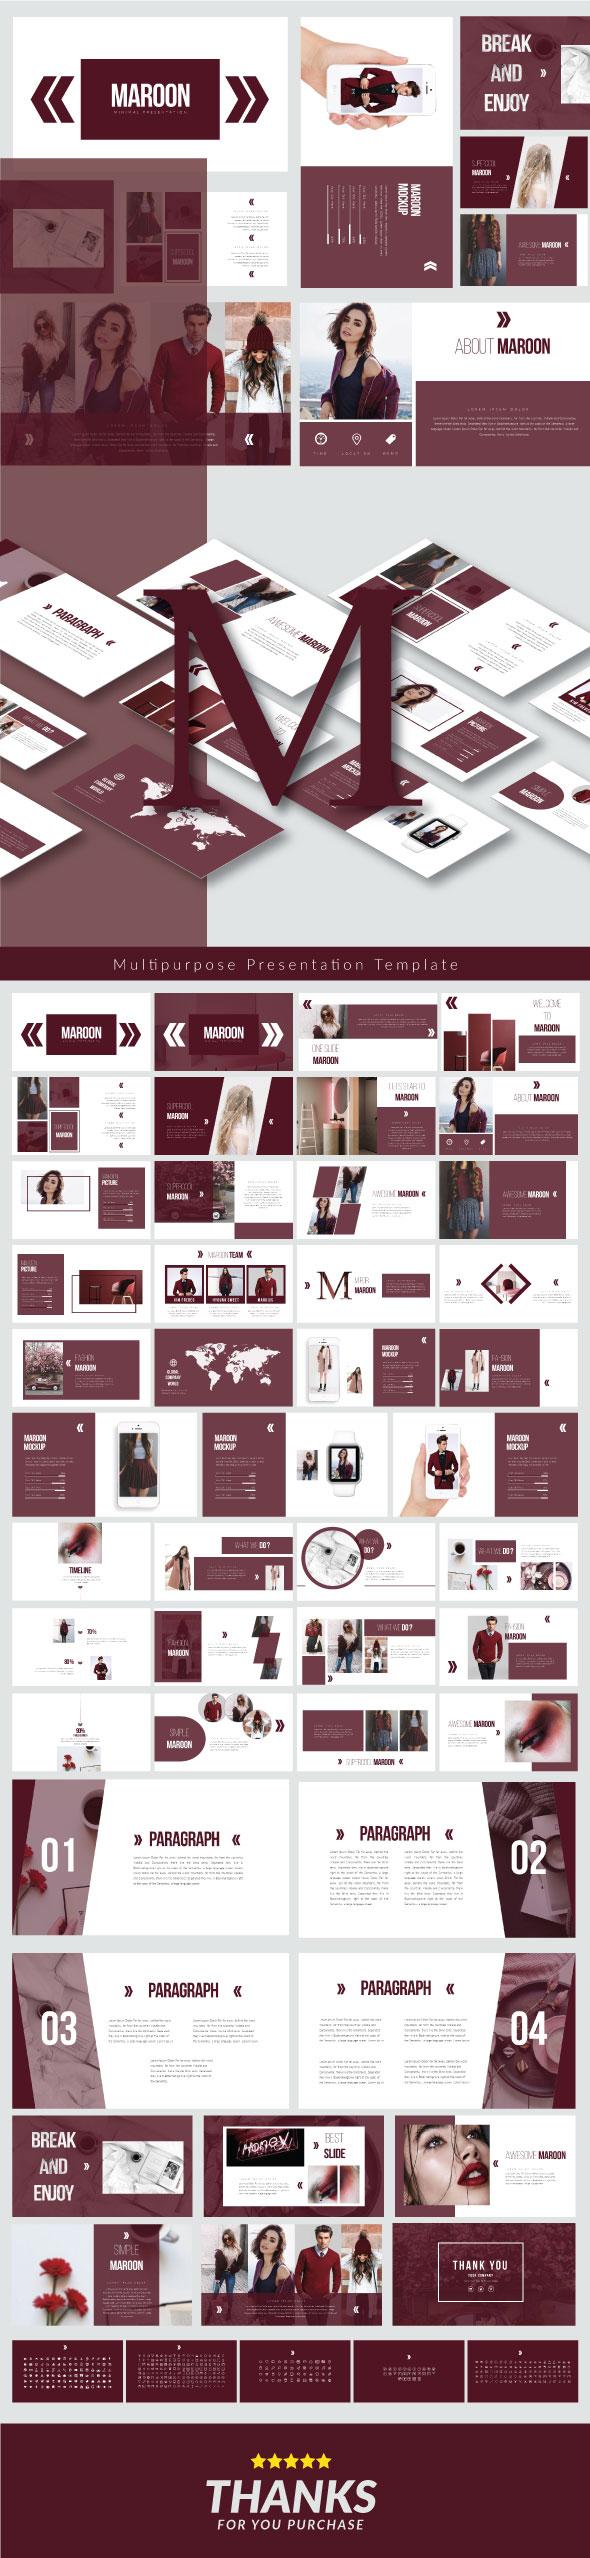 Maroon - Keynote Presentation Templates - Keynote Templates Presentation Templates